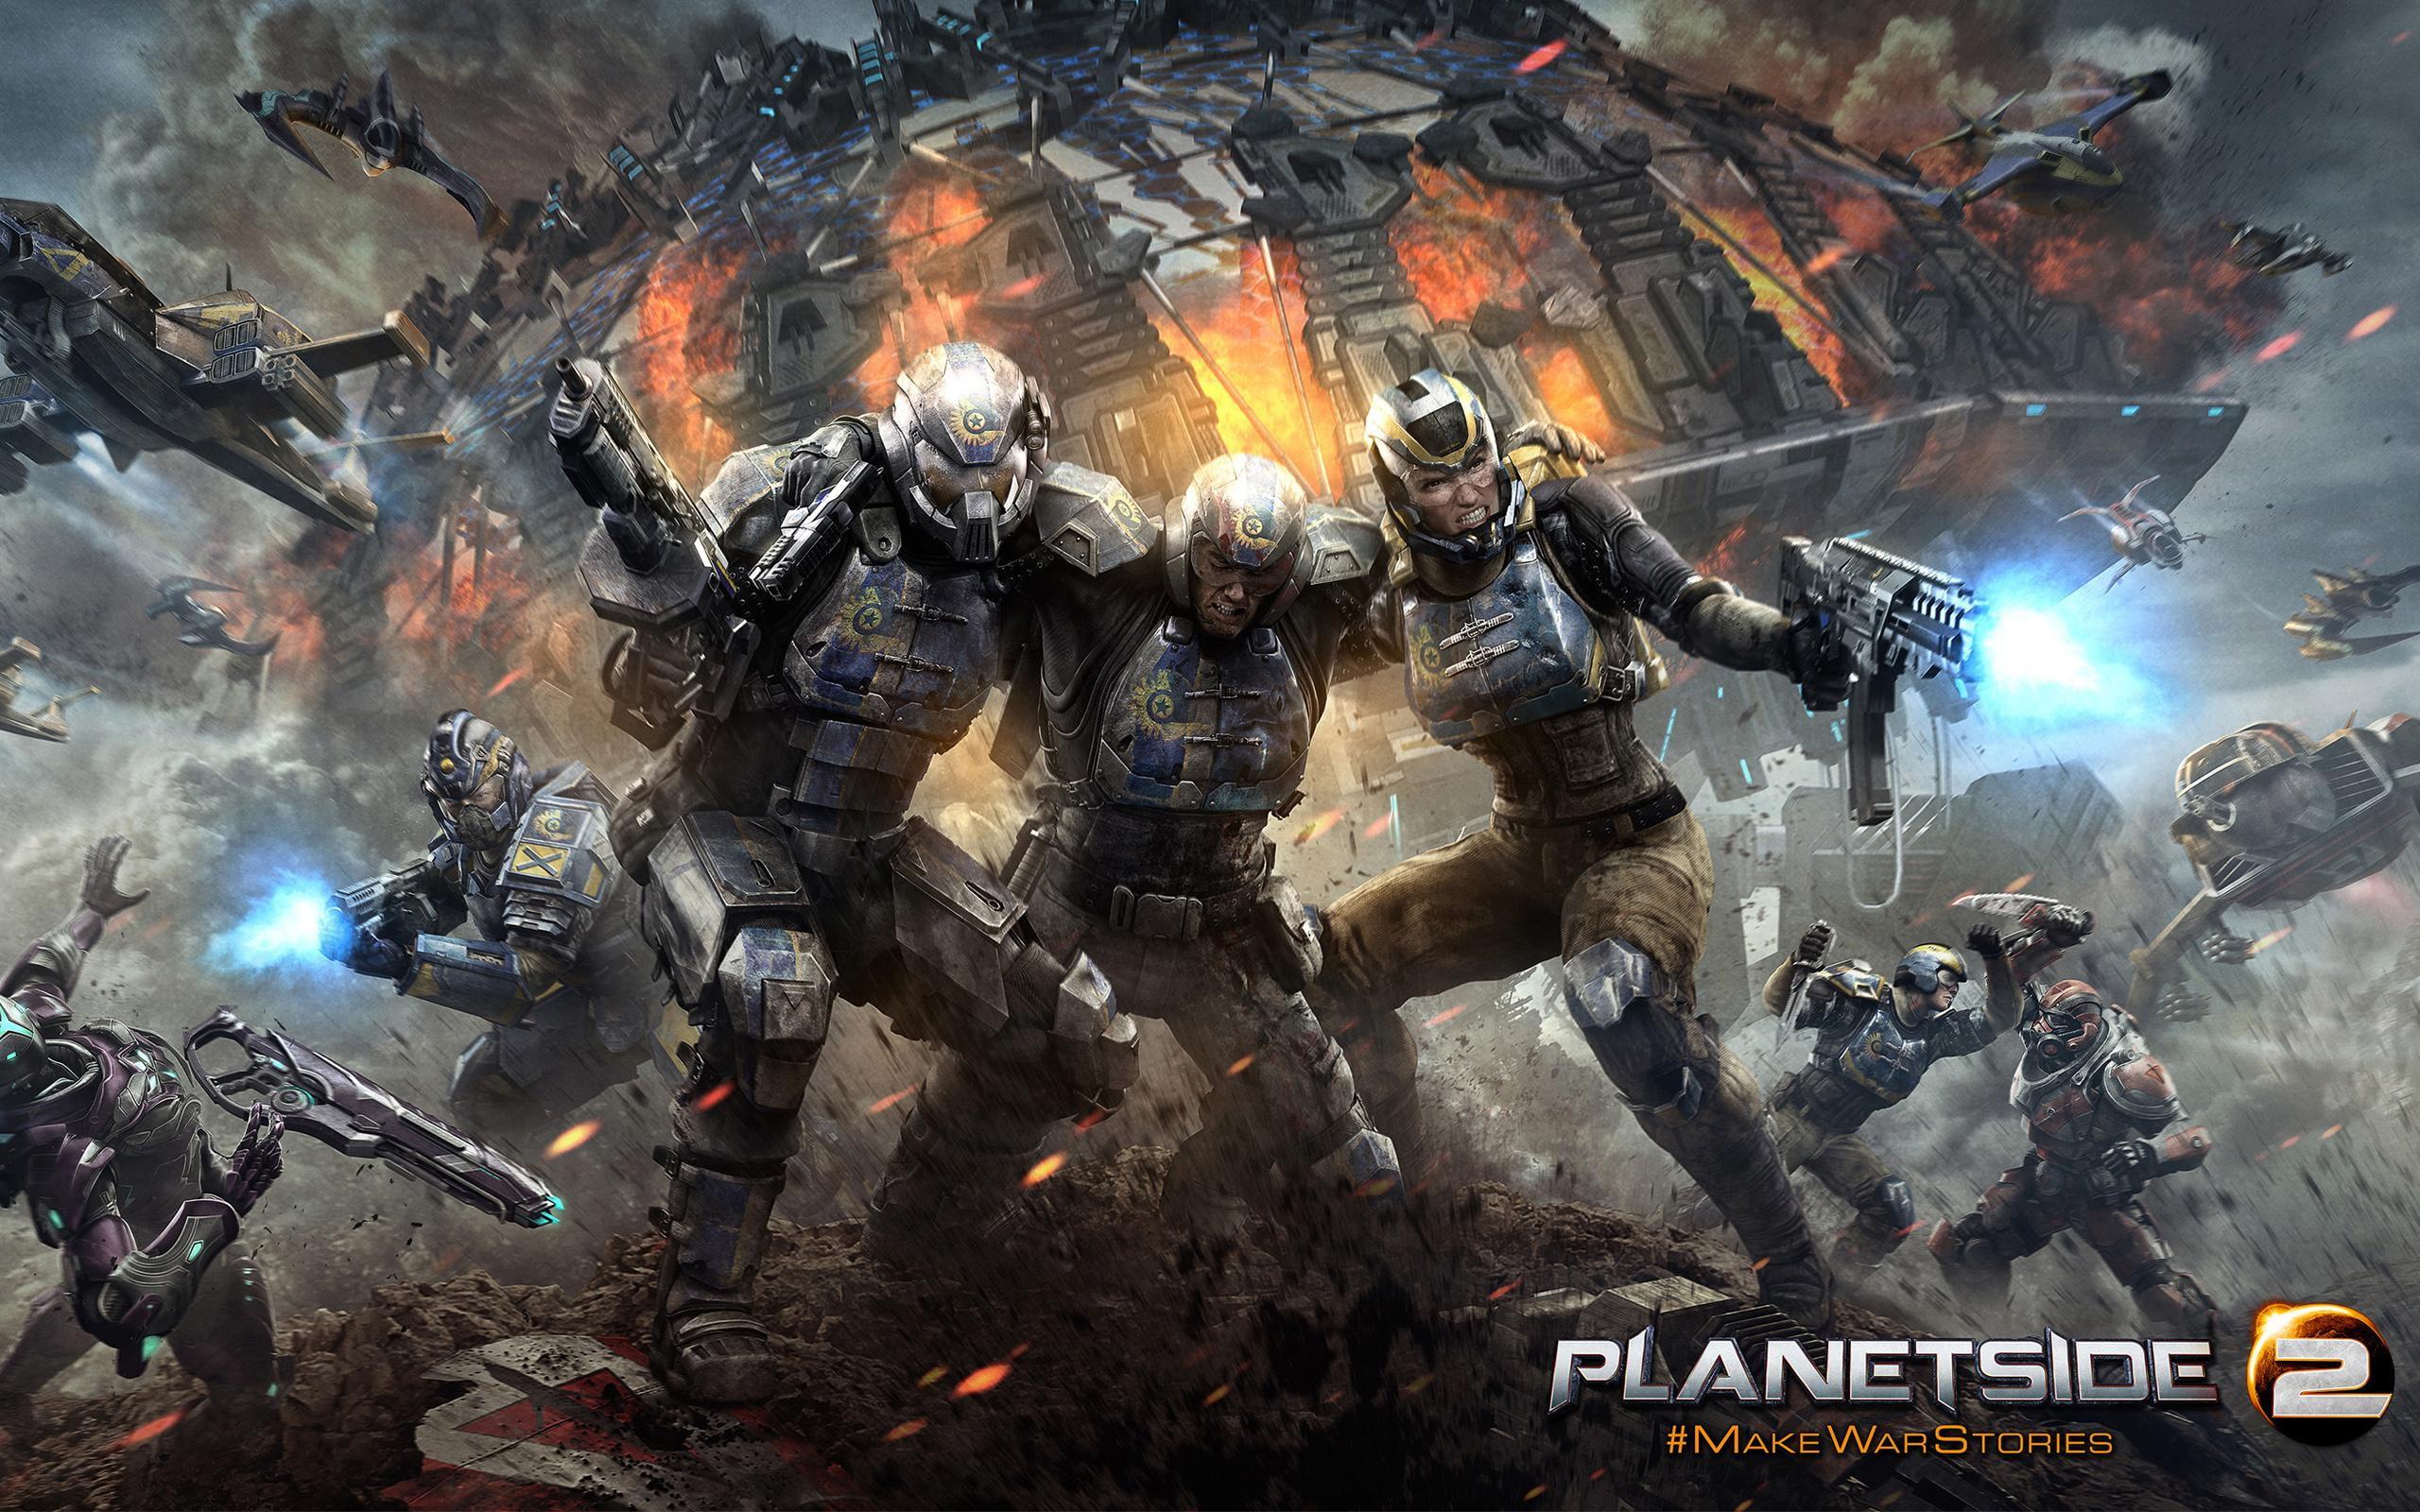 HD wallpaper Planetside 2 PS4 Wallpaper Flare 2560x1600